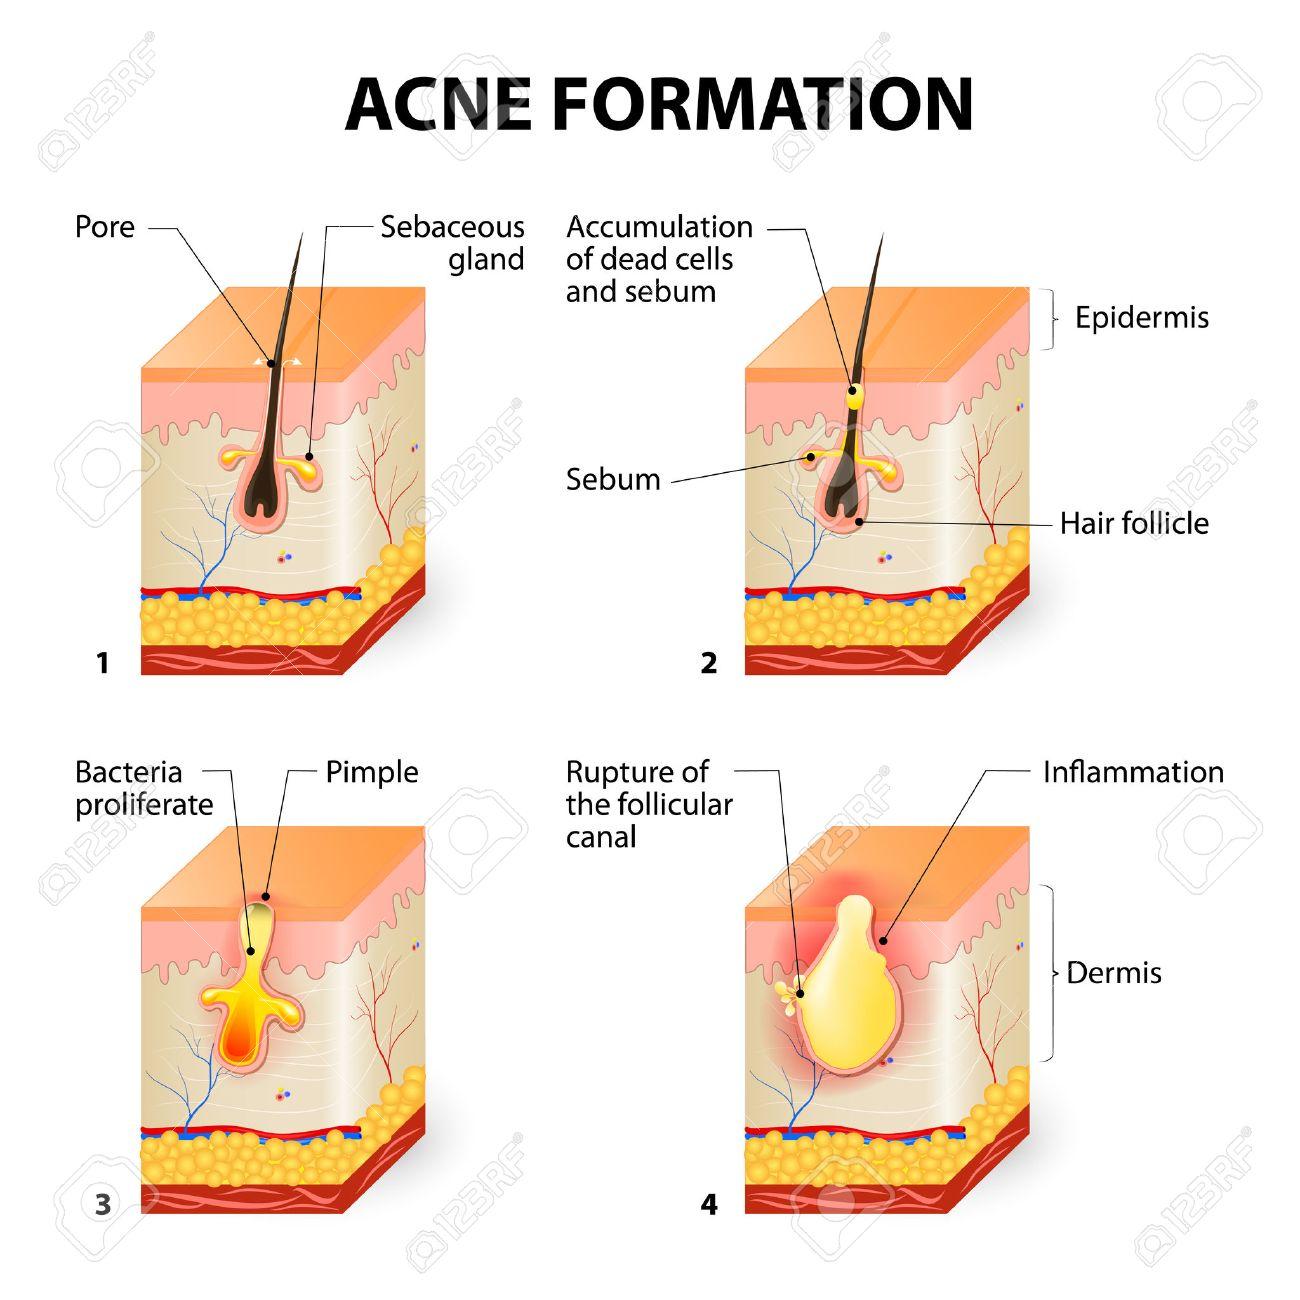 http://n3.datasn.io/data/api/v1/n3zm/image_of_skin_disease_5/by_table/skin_disease_image_download_access/f5/46/e9/46/f546e946ded293dcd535f9d26ea8386943cbb8aa.jpg